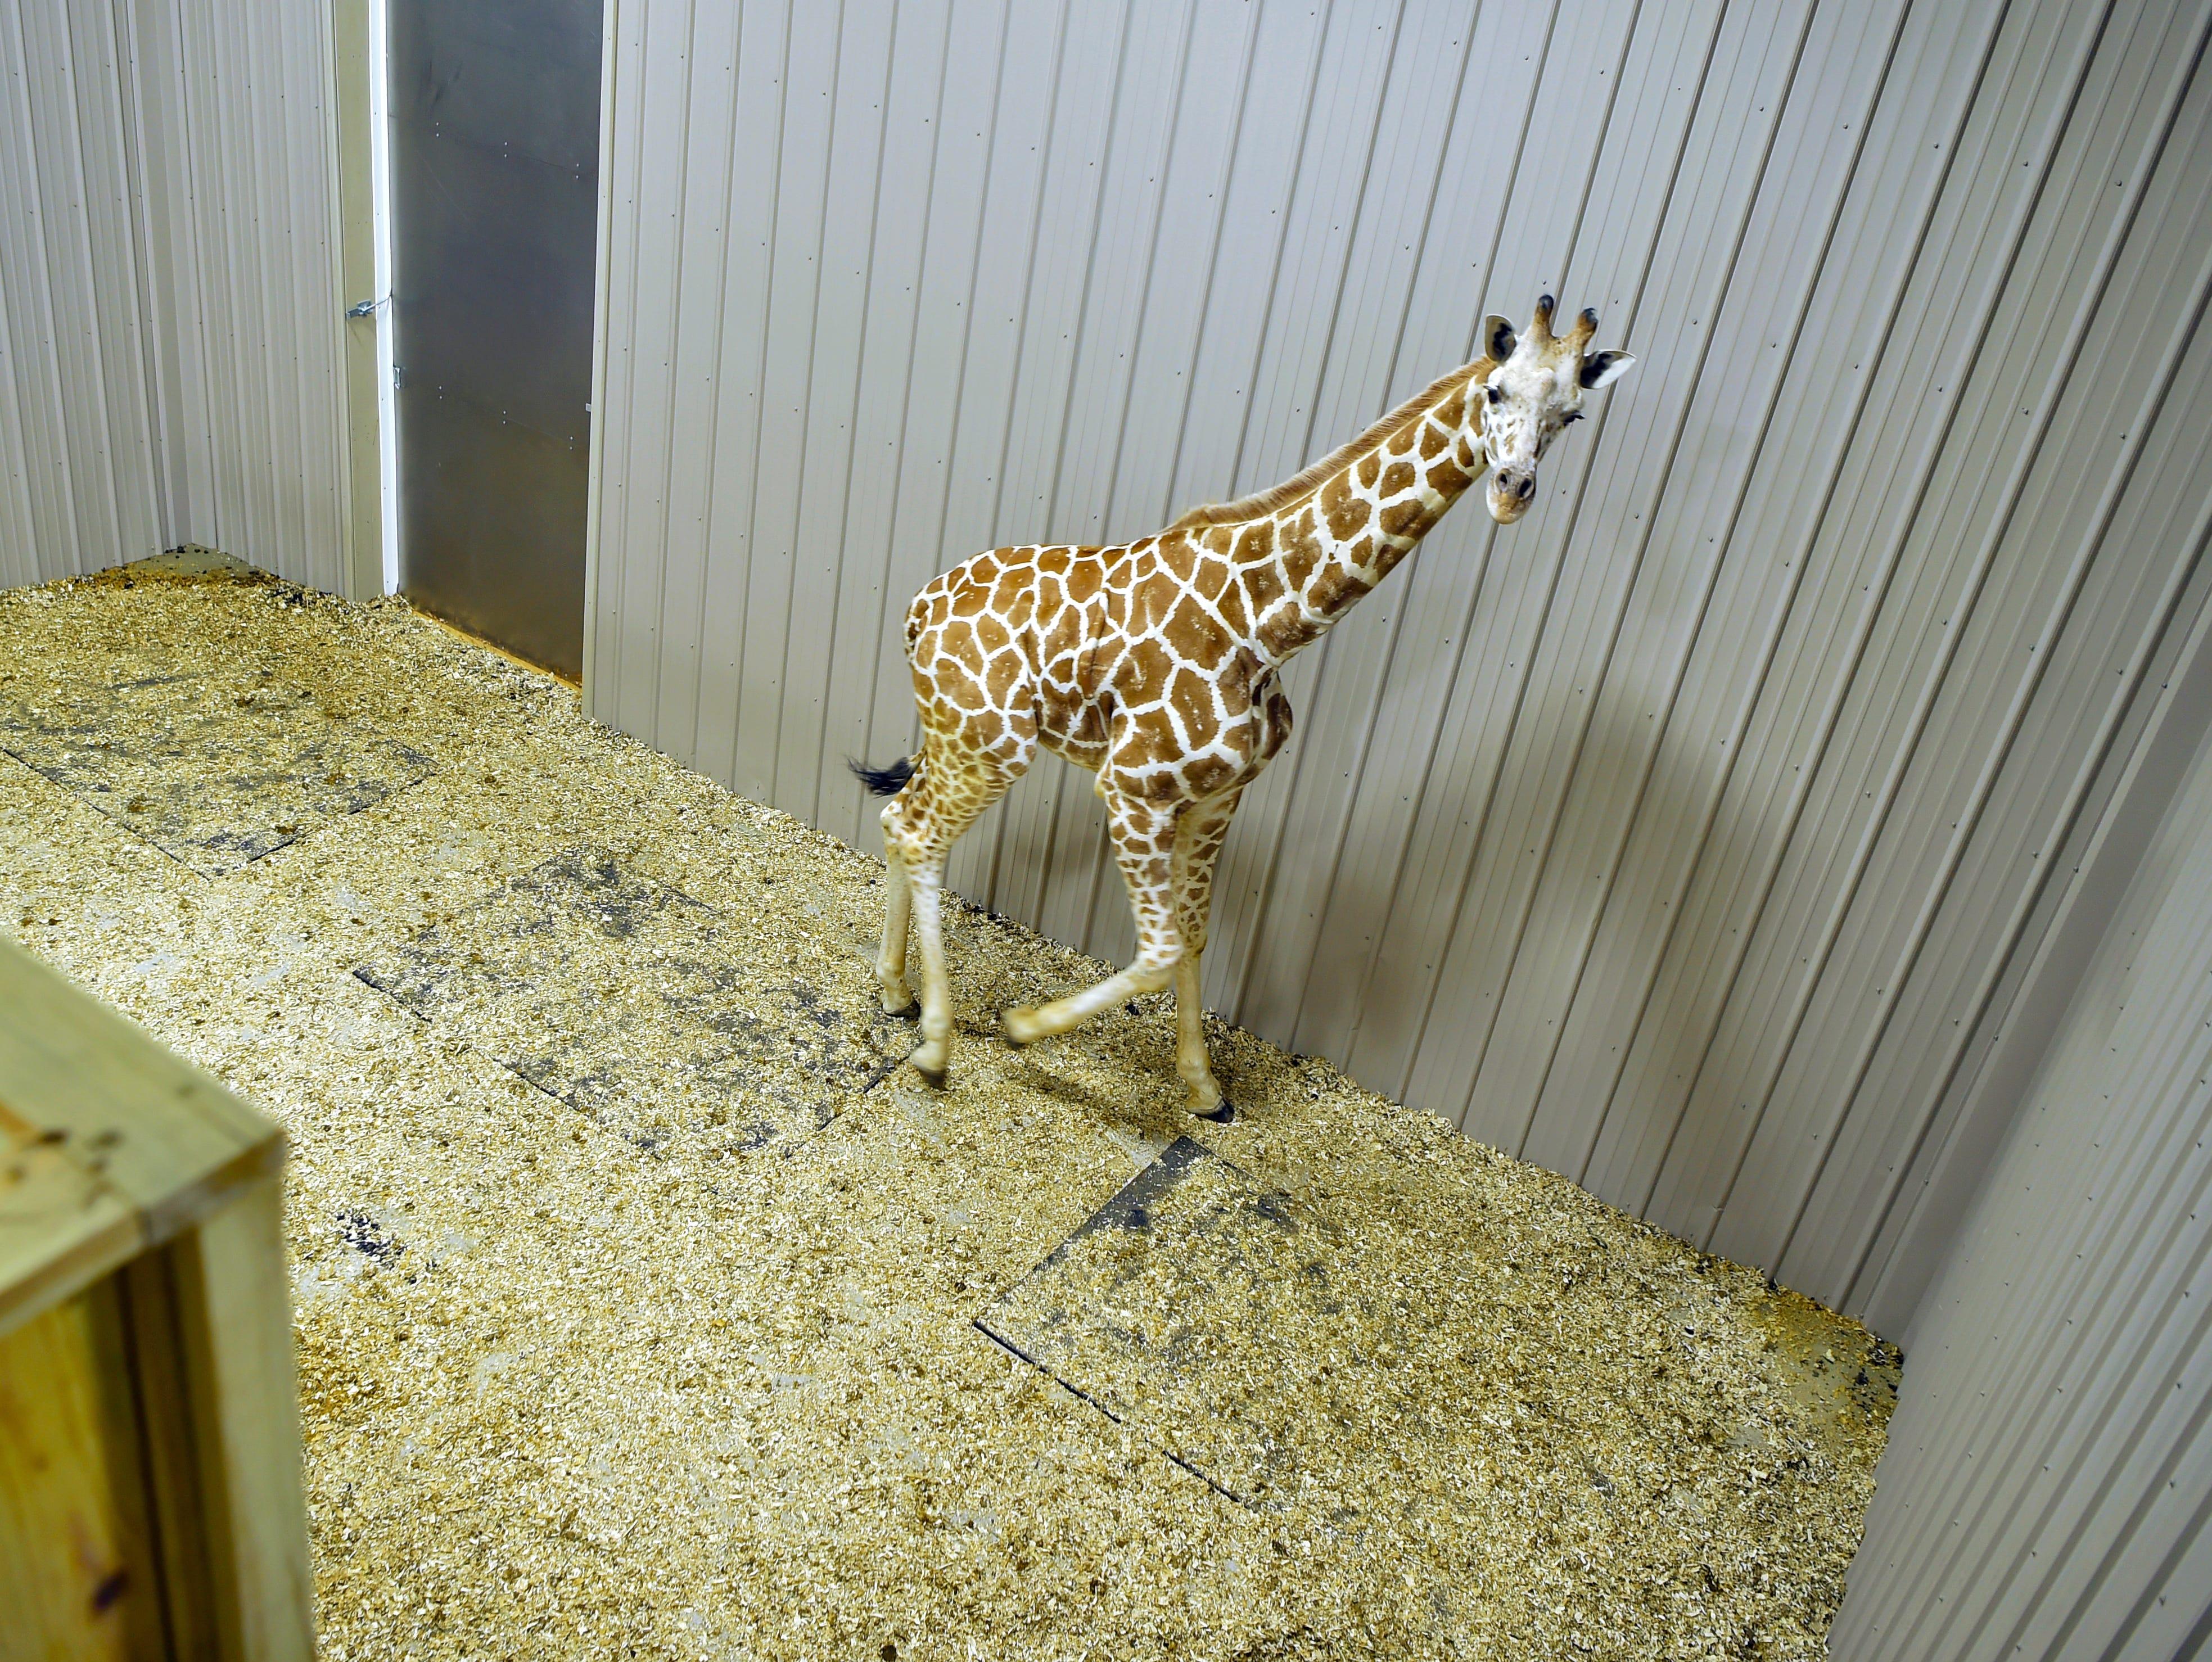 April The Giraffe's son Tajiri was recently moved into a new barn at Animal Adventure Park in Harpursville. December 4, 2018.